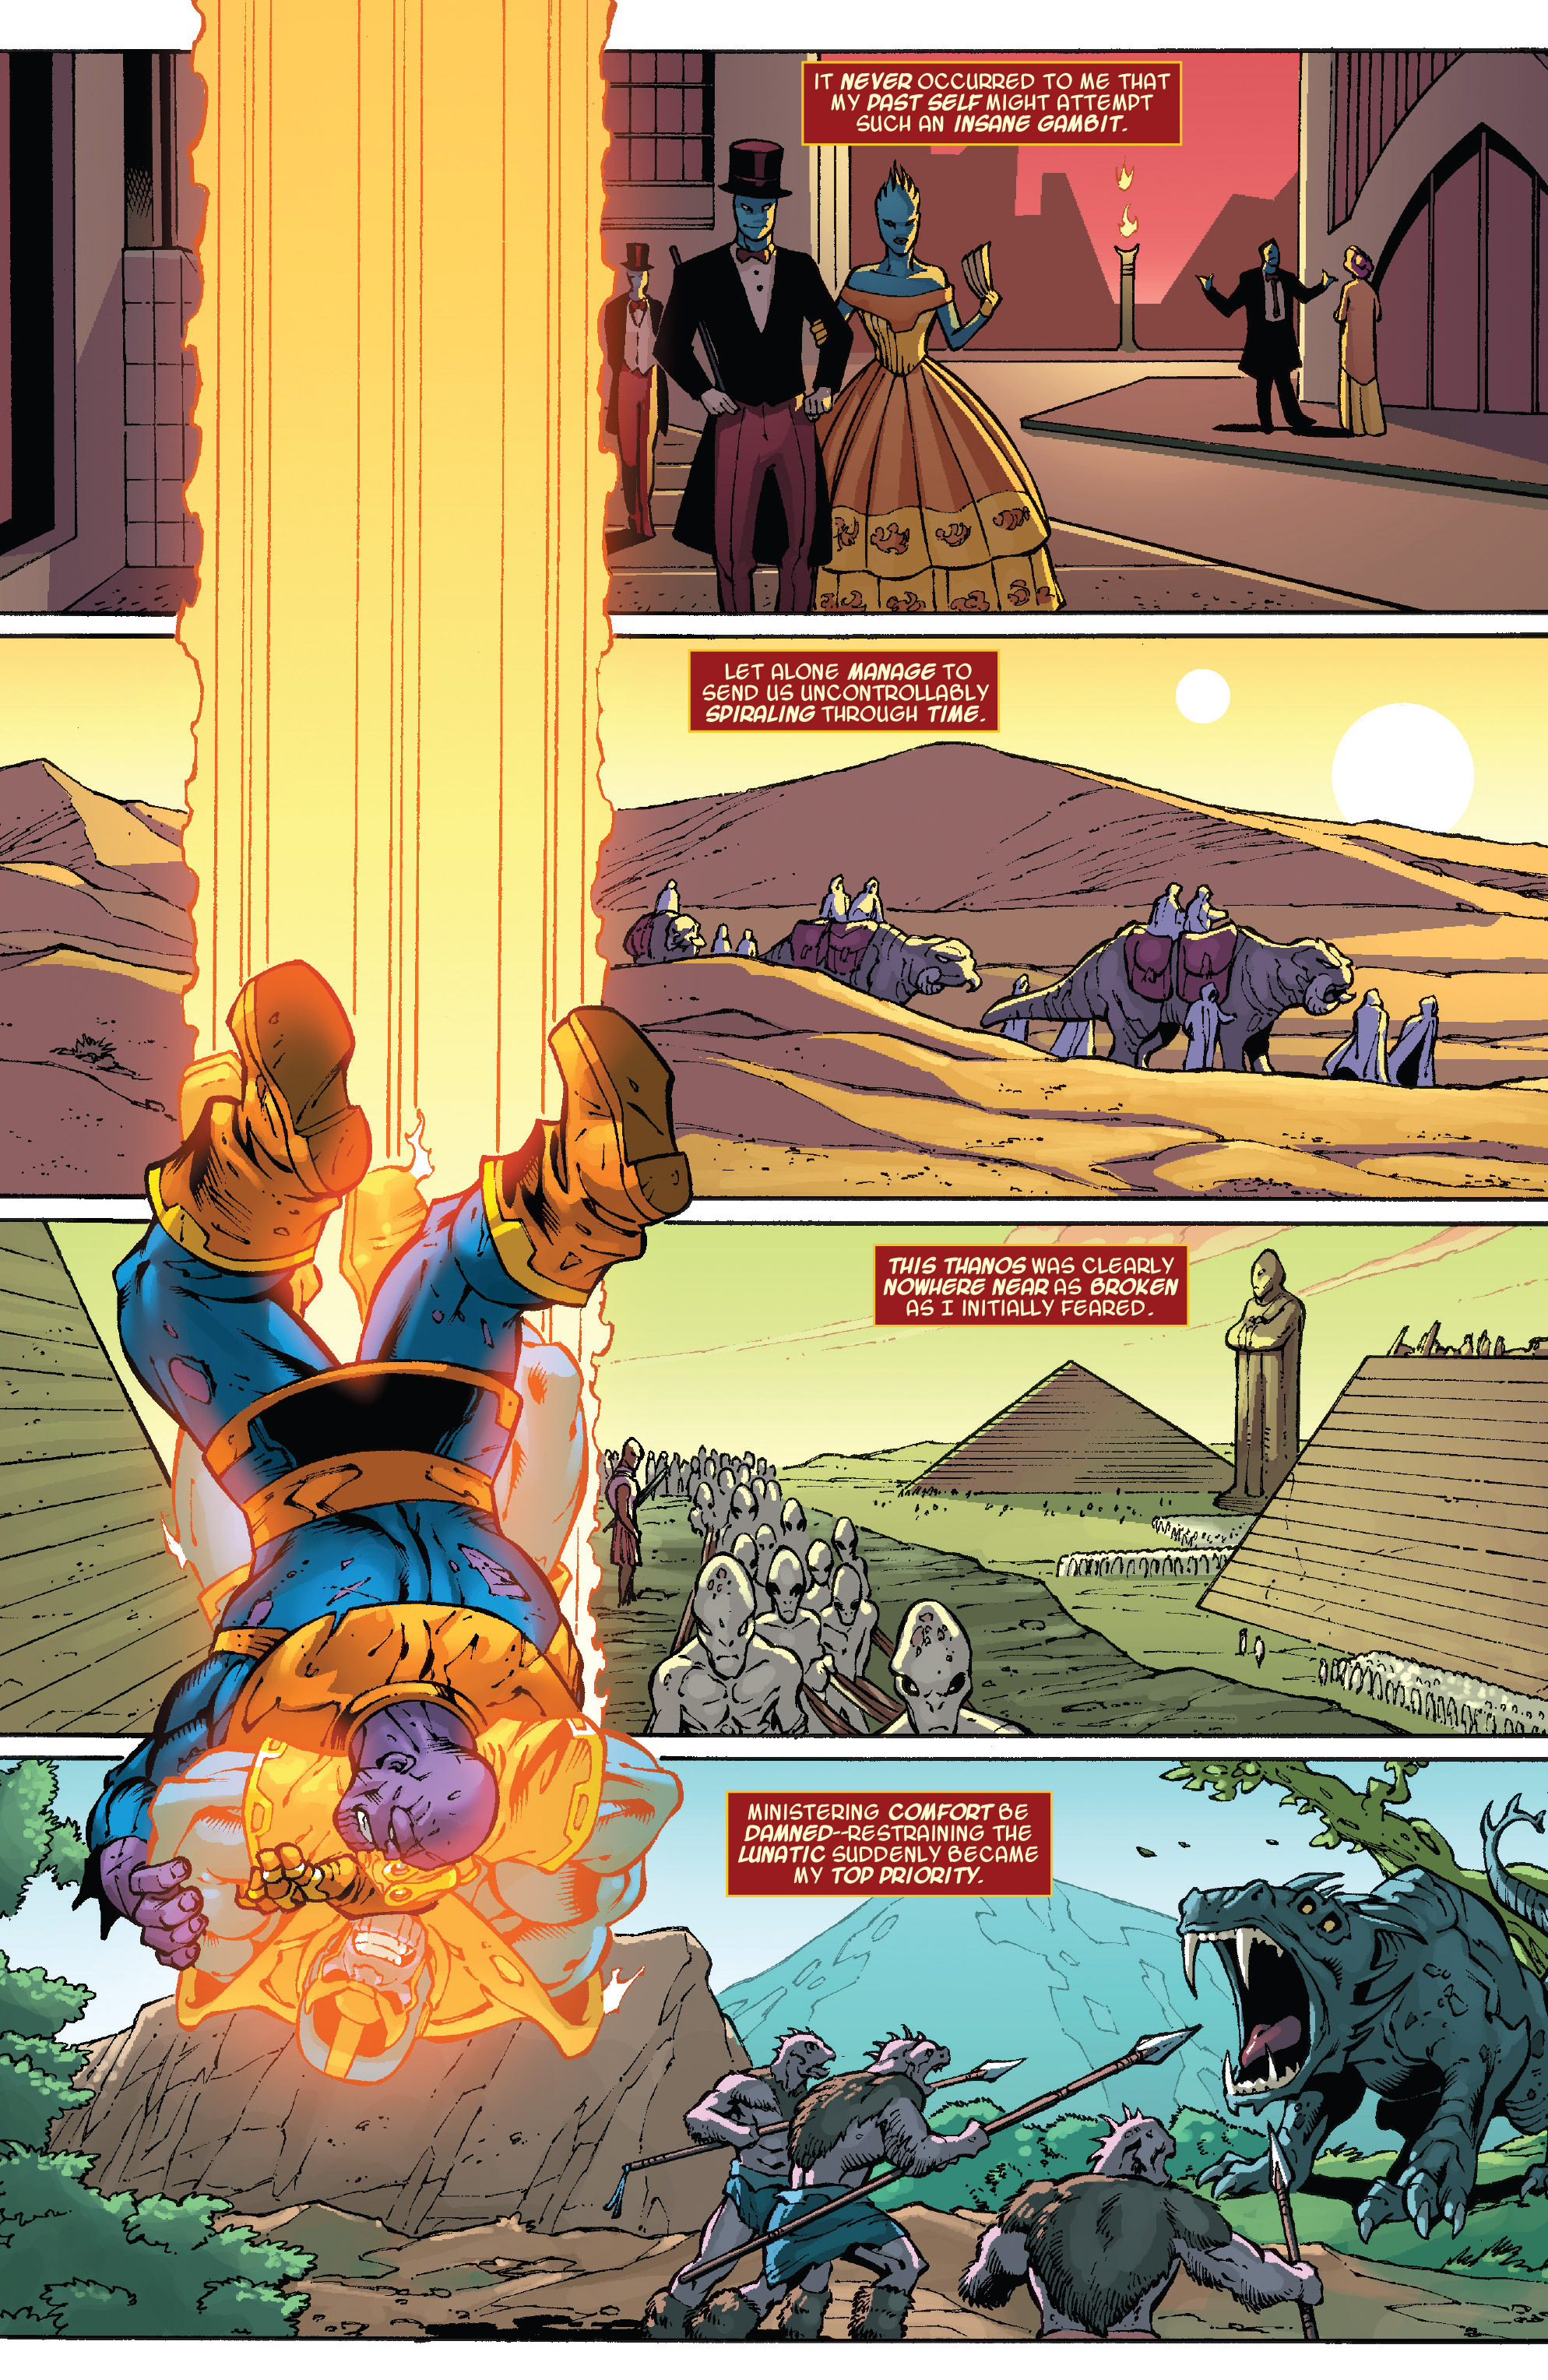 Read online Thanos Annual comic -  Issue # Annual - 17